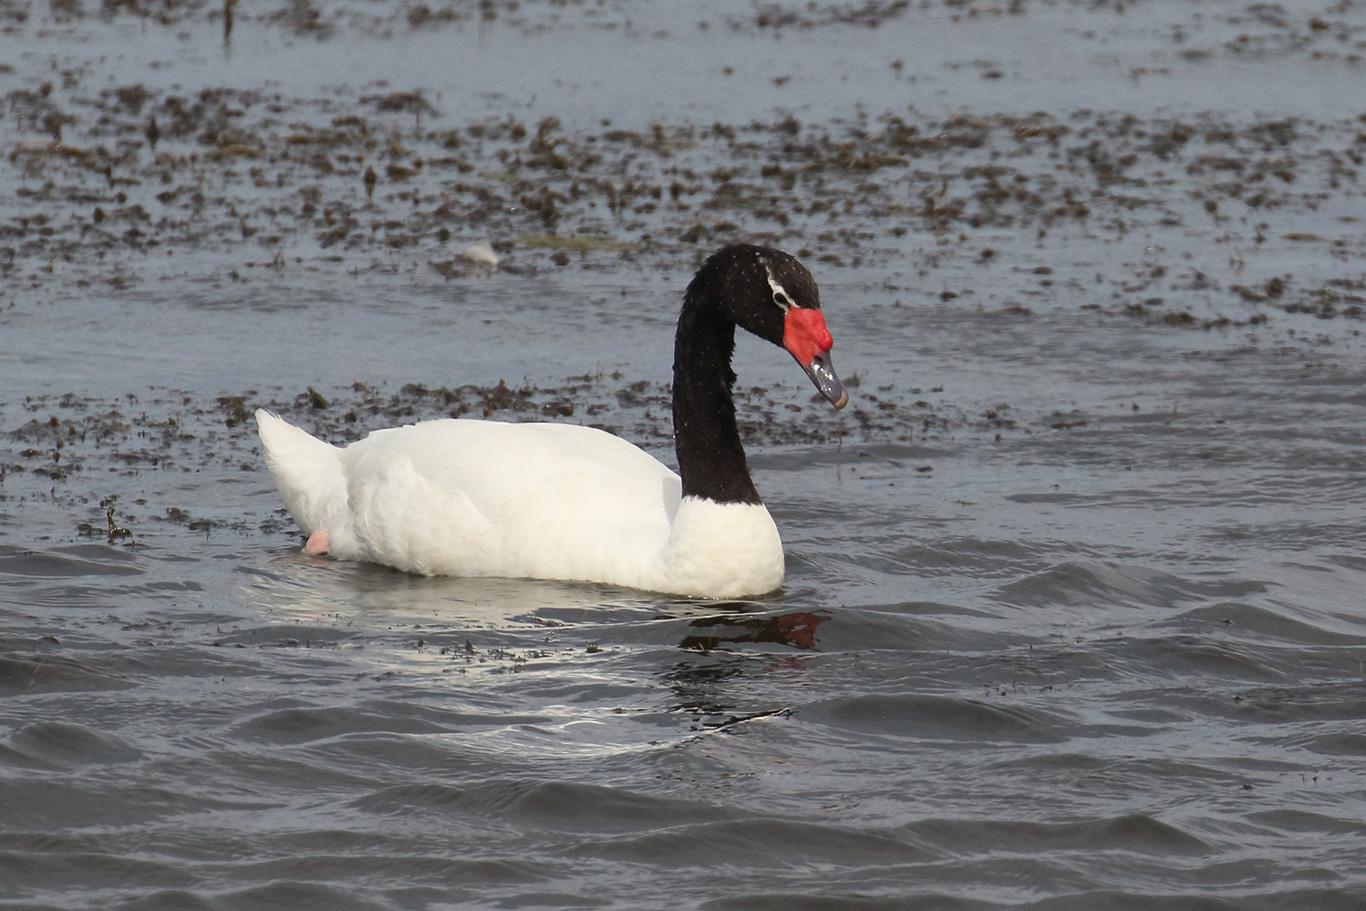 Black-necked Swan, Humedal Tres Puentes, Punta Arenas, Chile.